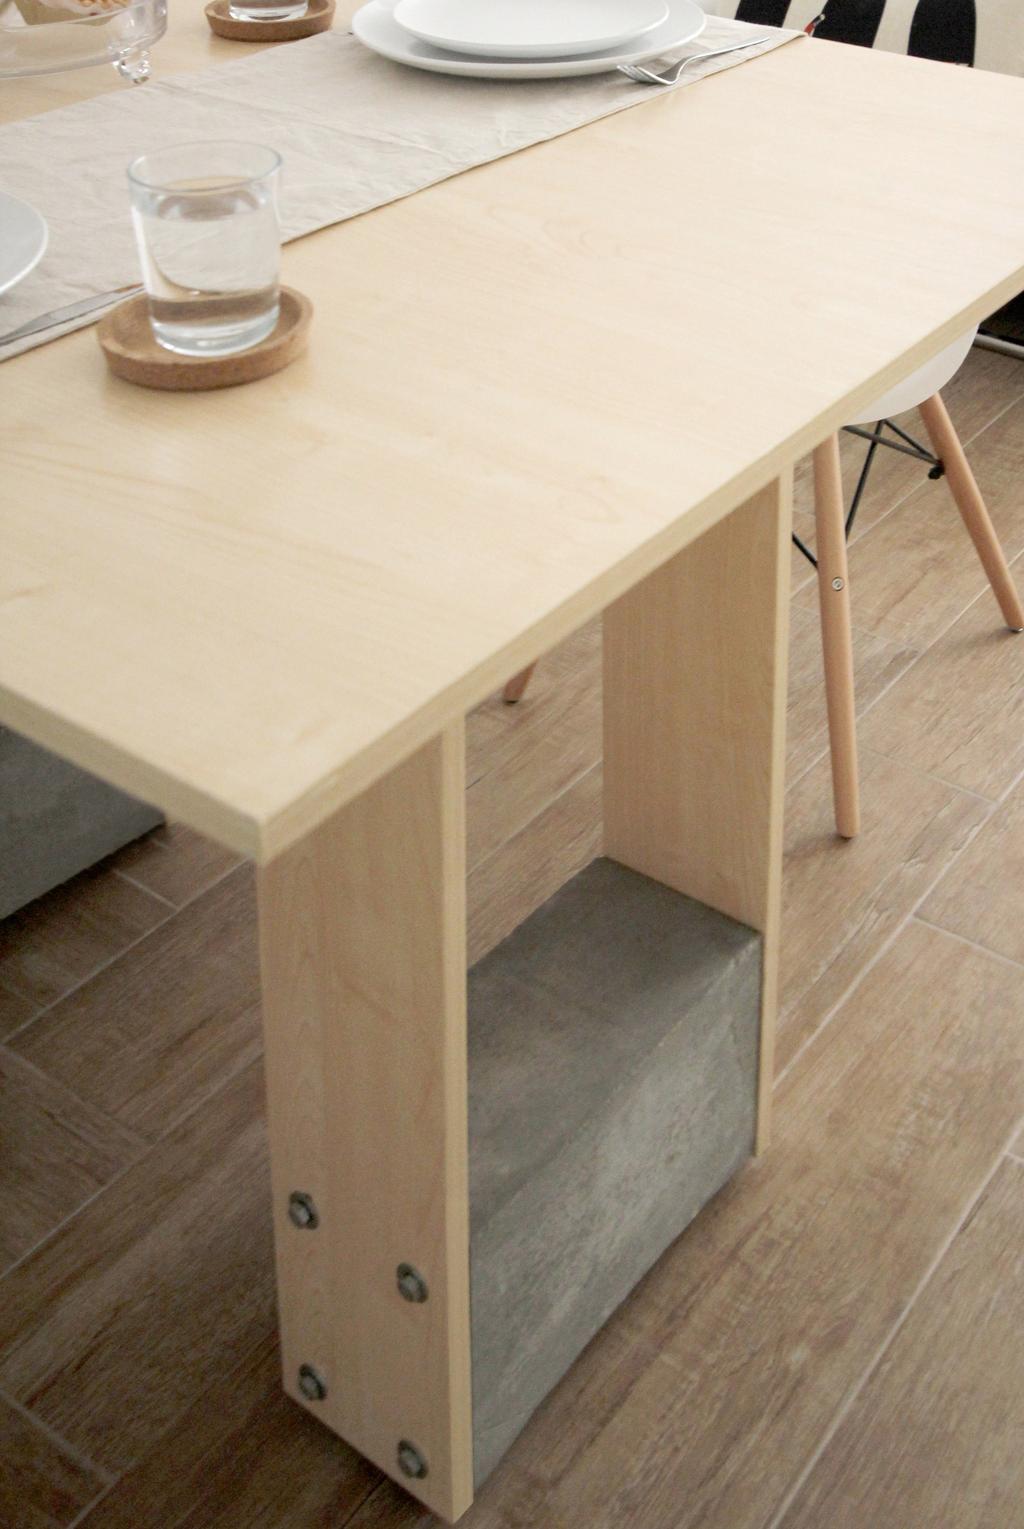 北歐, 公屋/居屋, 客廳, 寧峰苑, 室內設計師, MNOP Design, 簡約, Plywood, Wood, Dining Table, Furniture, Table